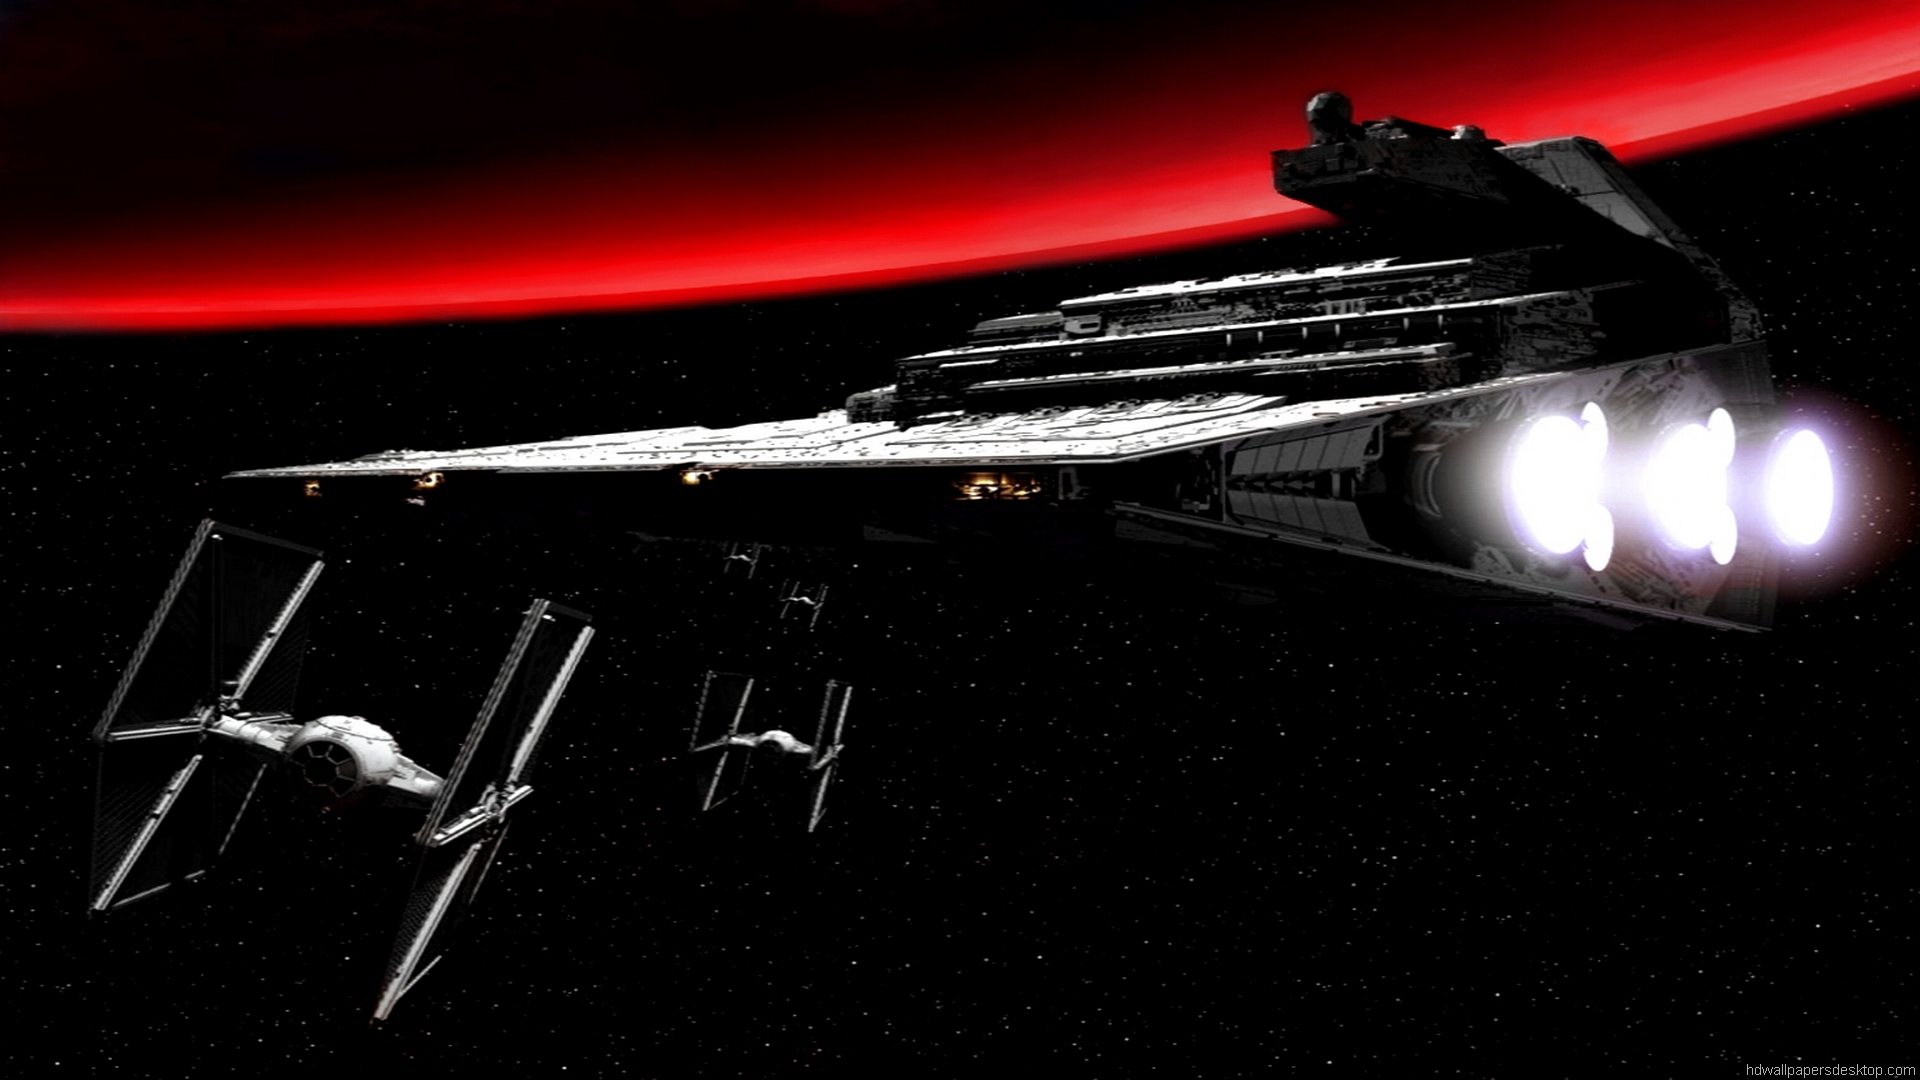 Free Download Star Wars Full Hd Wallpaper 1080p Desktop Star Wars Empire 1920x1080 For Your Desktop Mobile Tablet Explore 44 Hd Star Wars Wallpapers 1080p Hd Star Wars Wallpaper